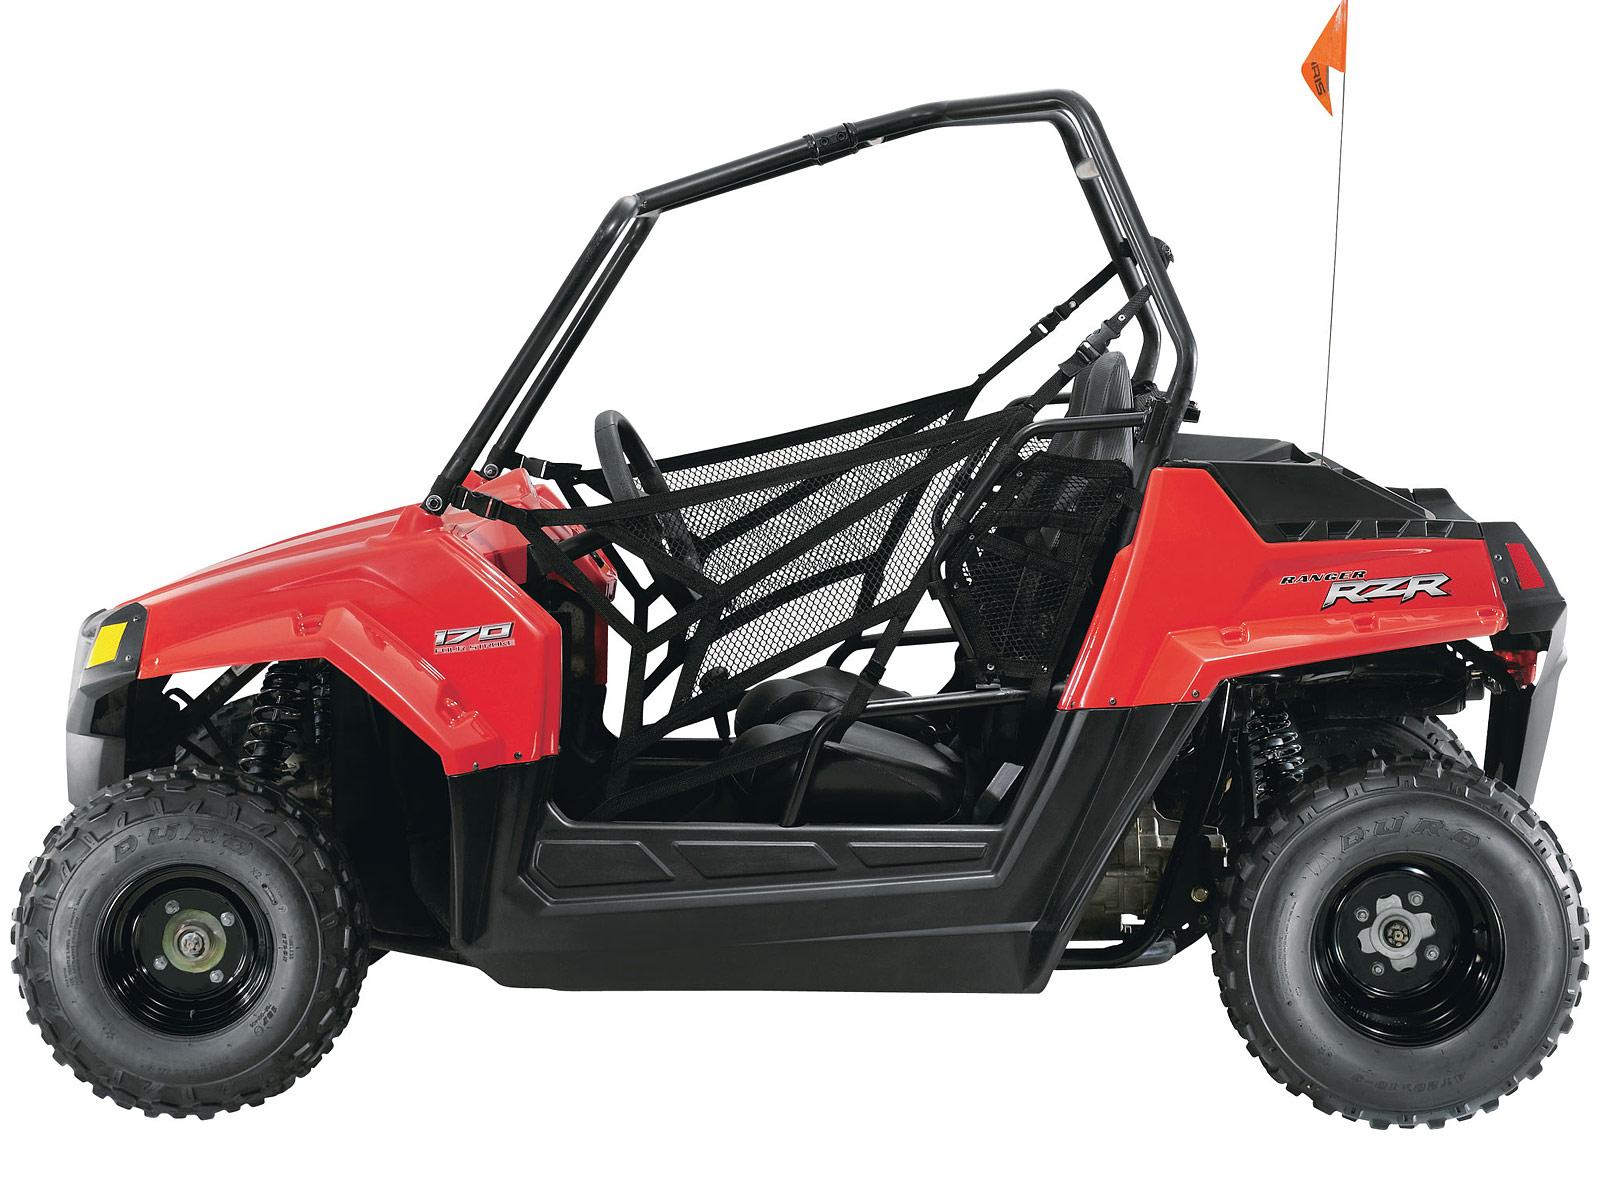 2012 POLARIS Ranger RZR 170 ATV wallpapers review 1600x1200